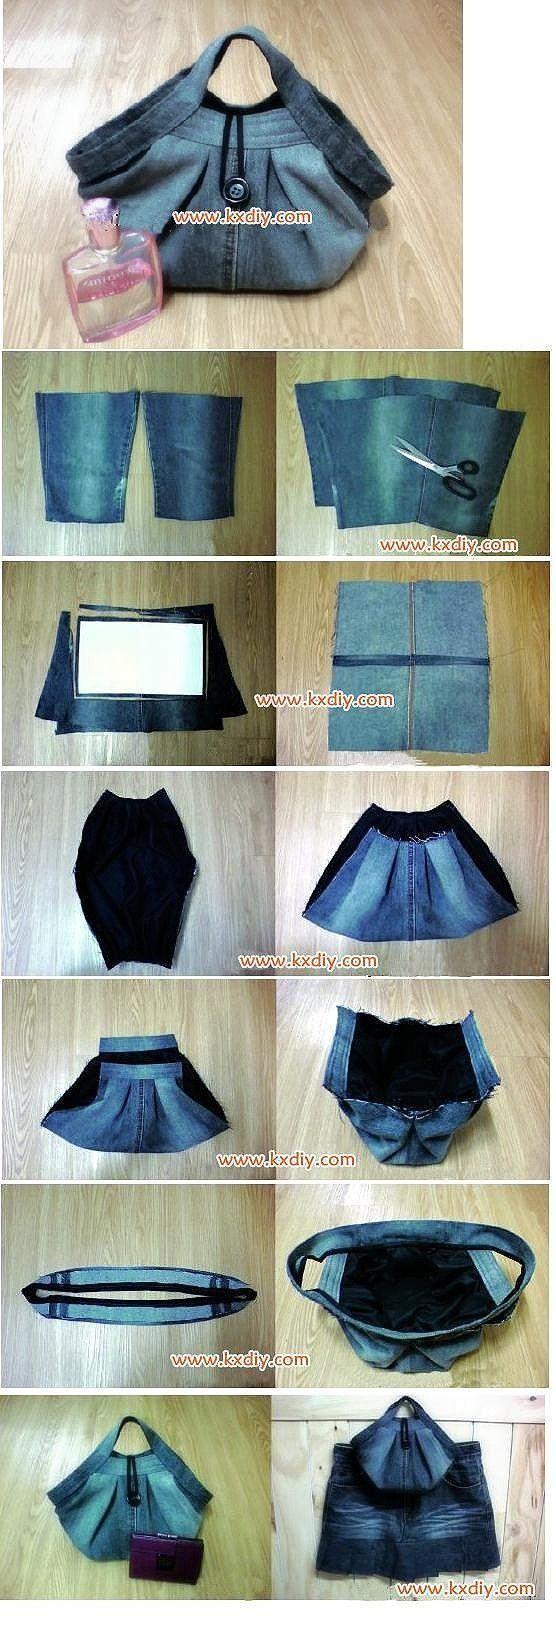 DIY Stylish Handbag from Used Jeans | iCreativeIdeas.com Like Us on Facebook ==> https://www.facebook.com/icreativeideas: